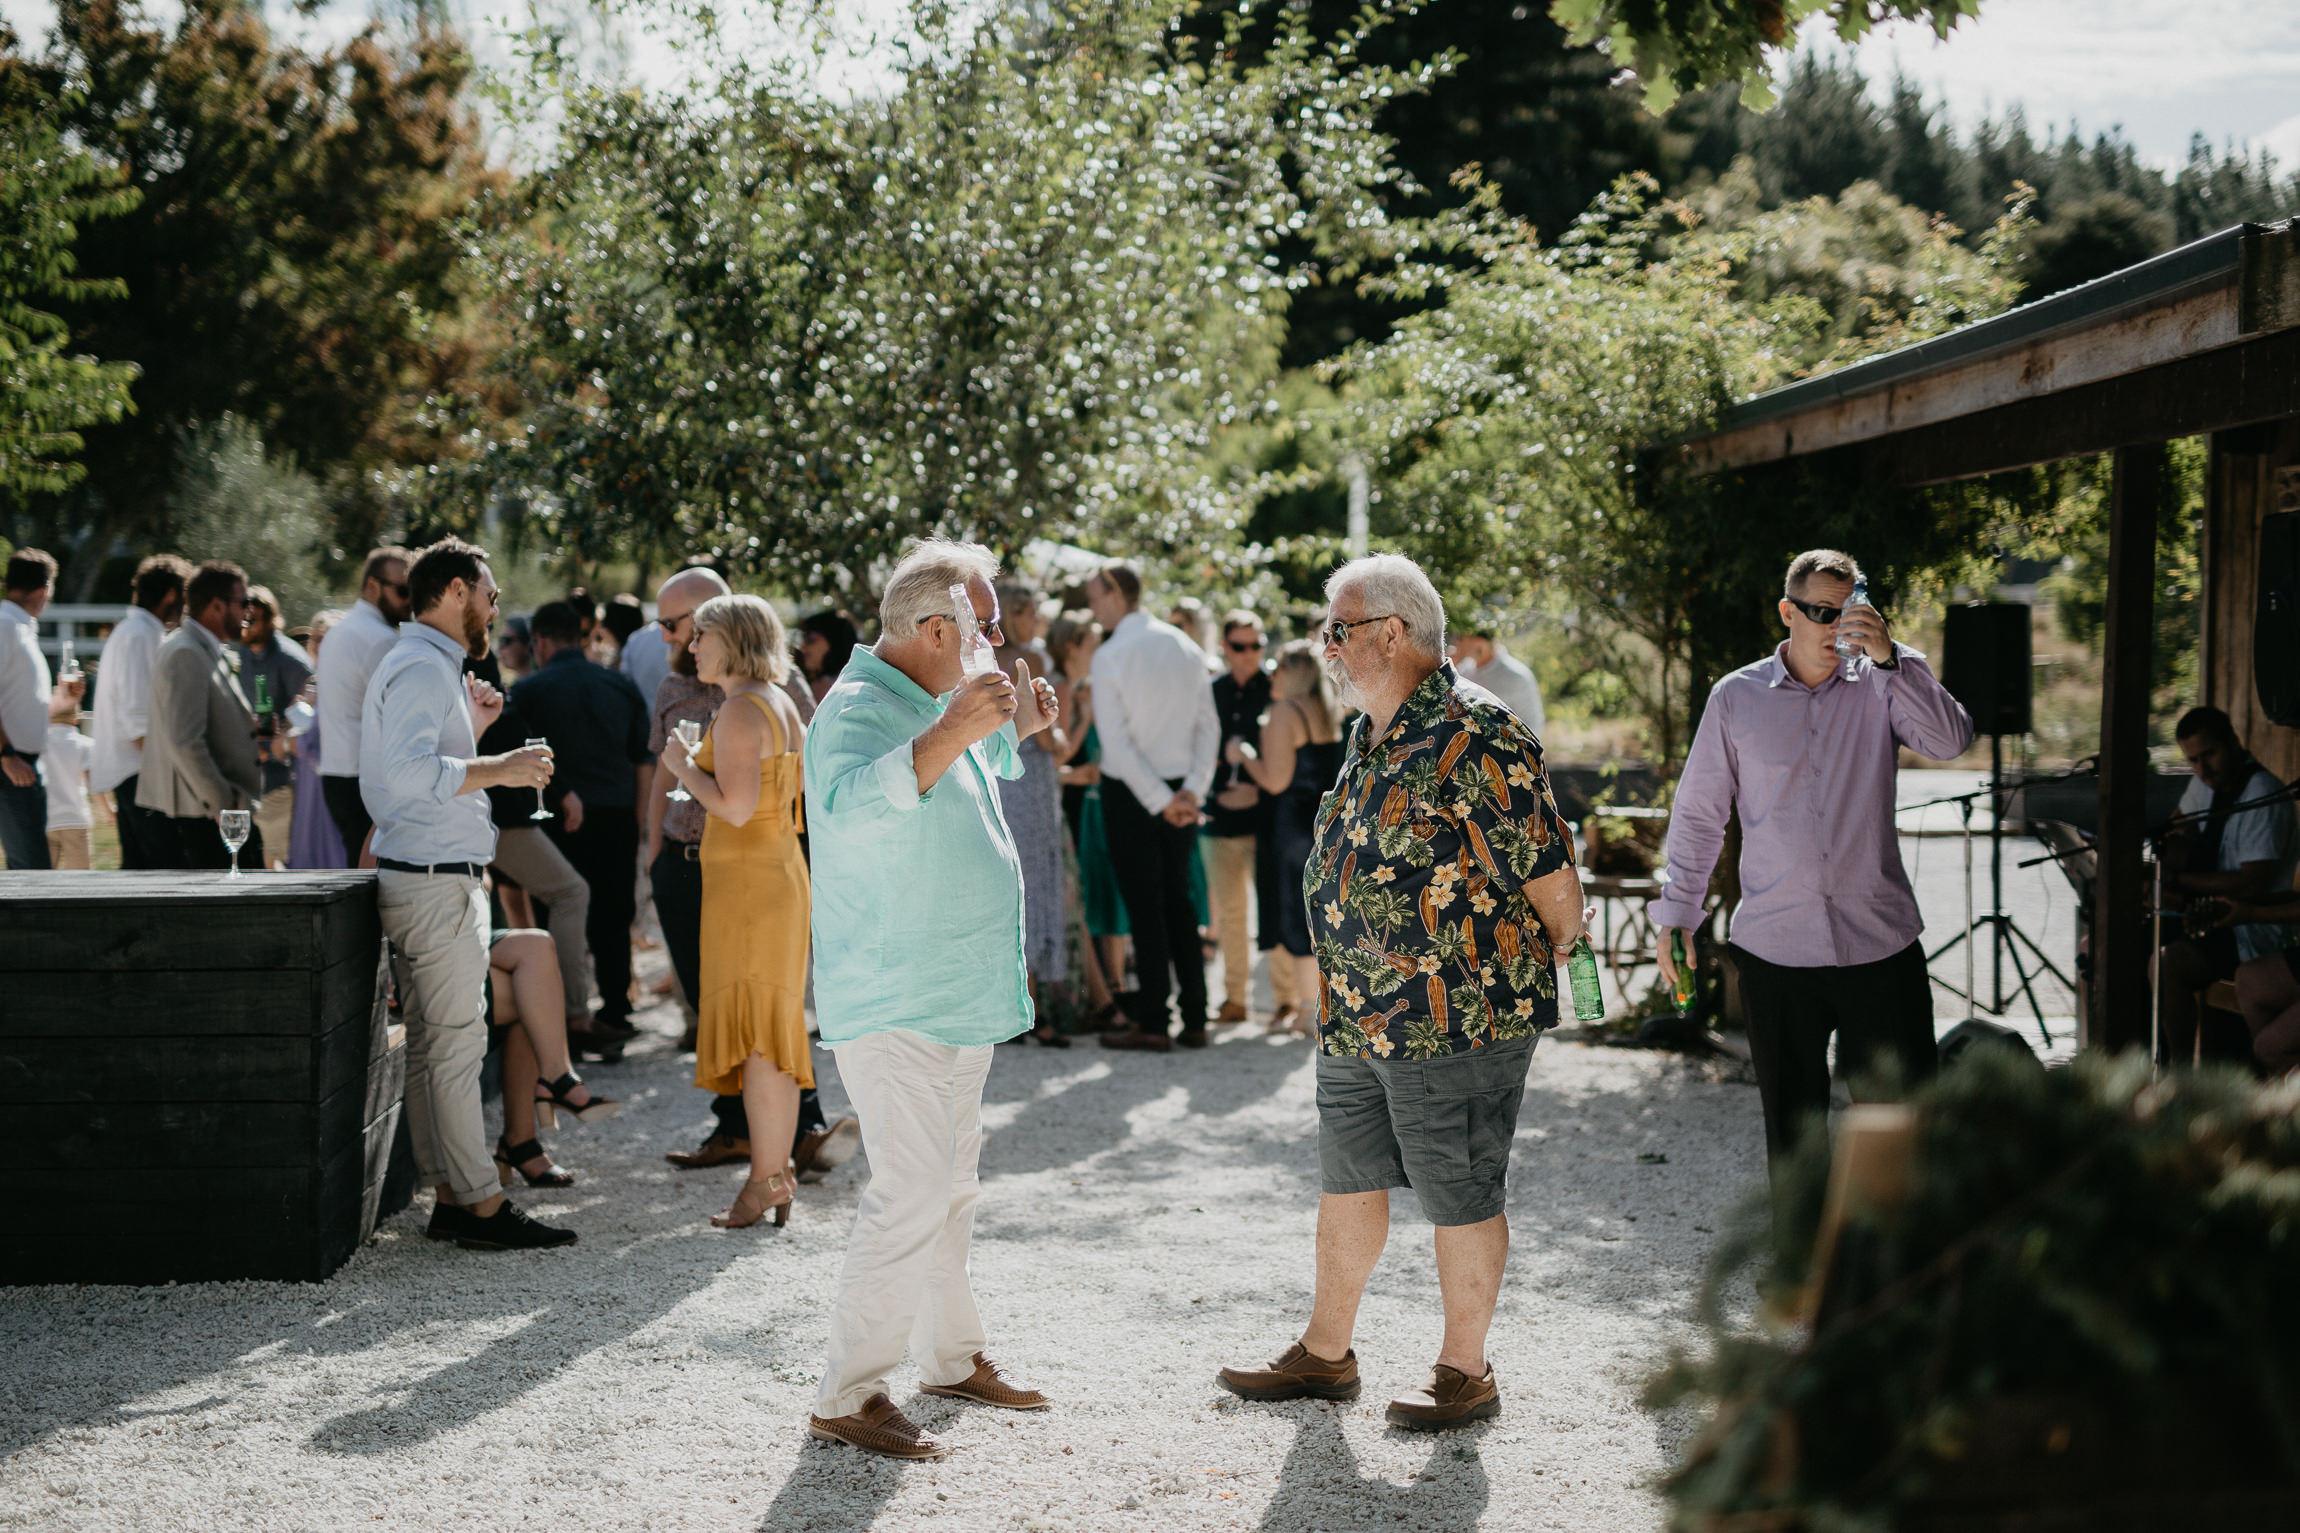 oldforestschool-wedding-blog-134.jpg